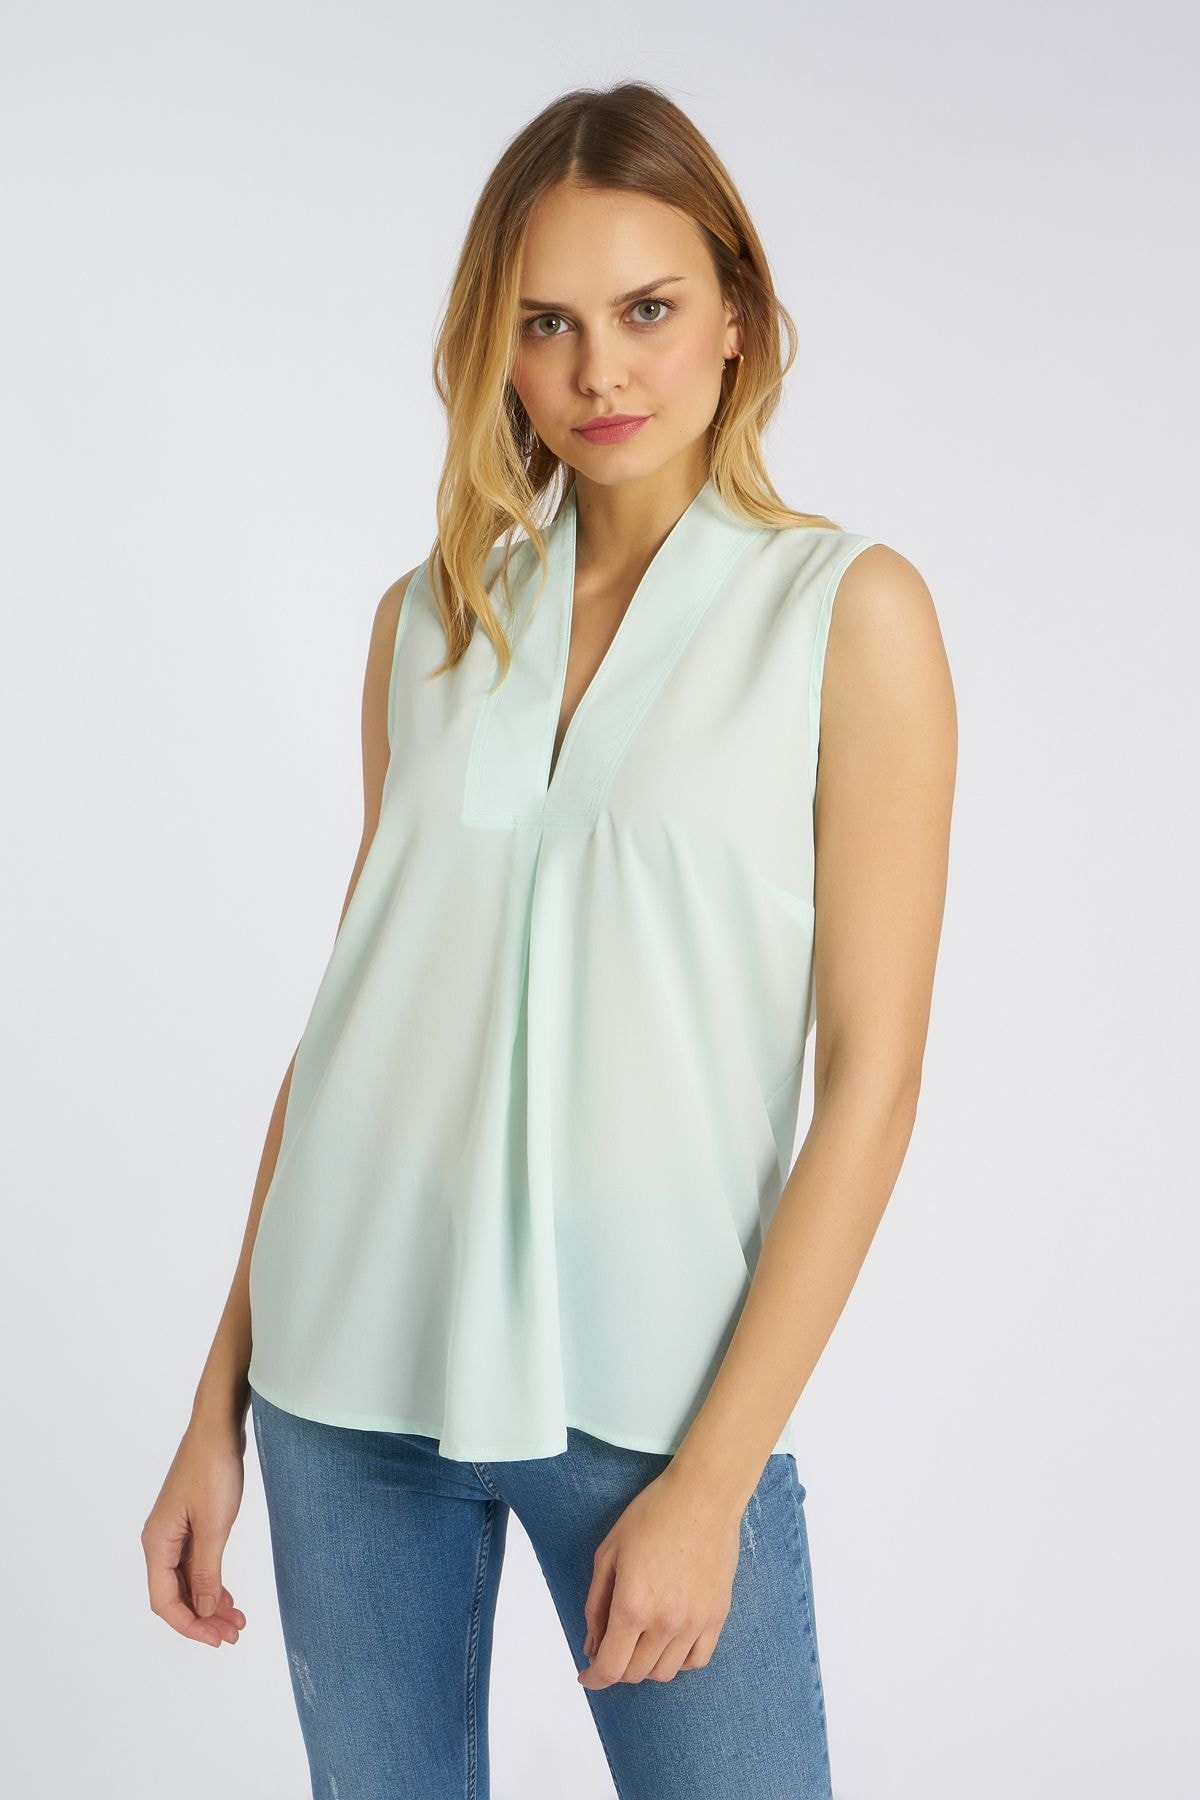 Home Store Kadın Mint Bluz 19230007153